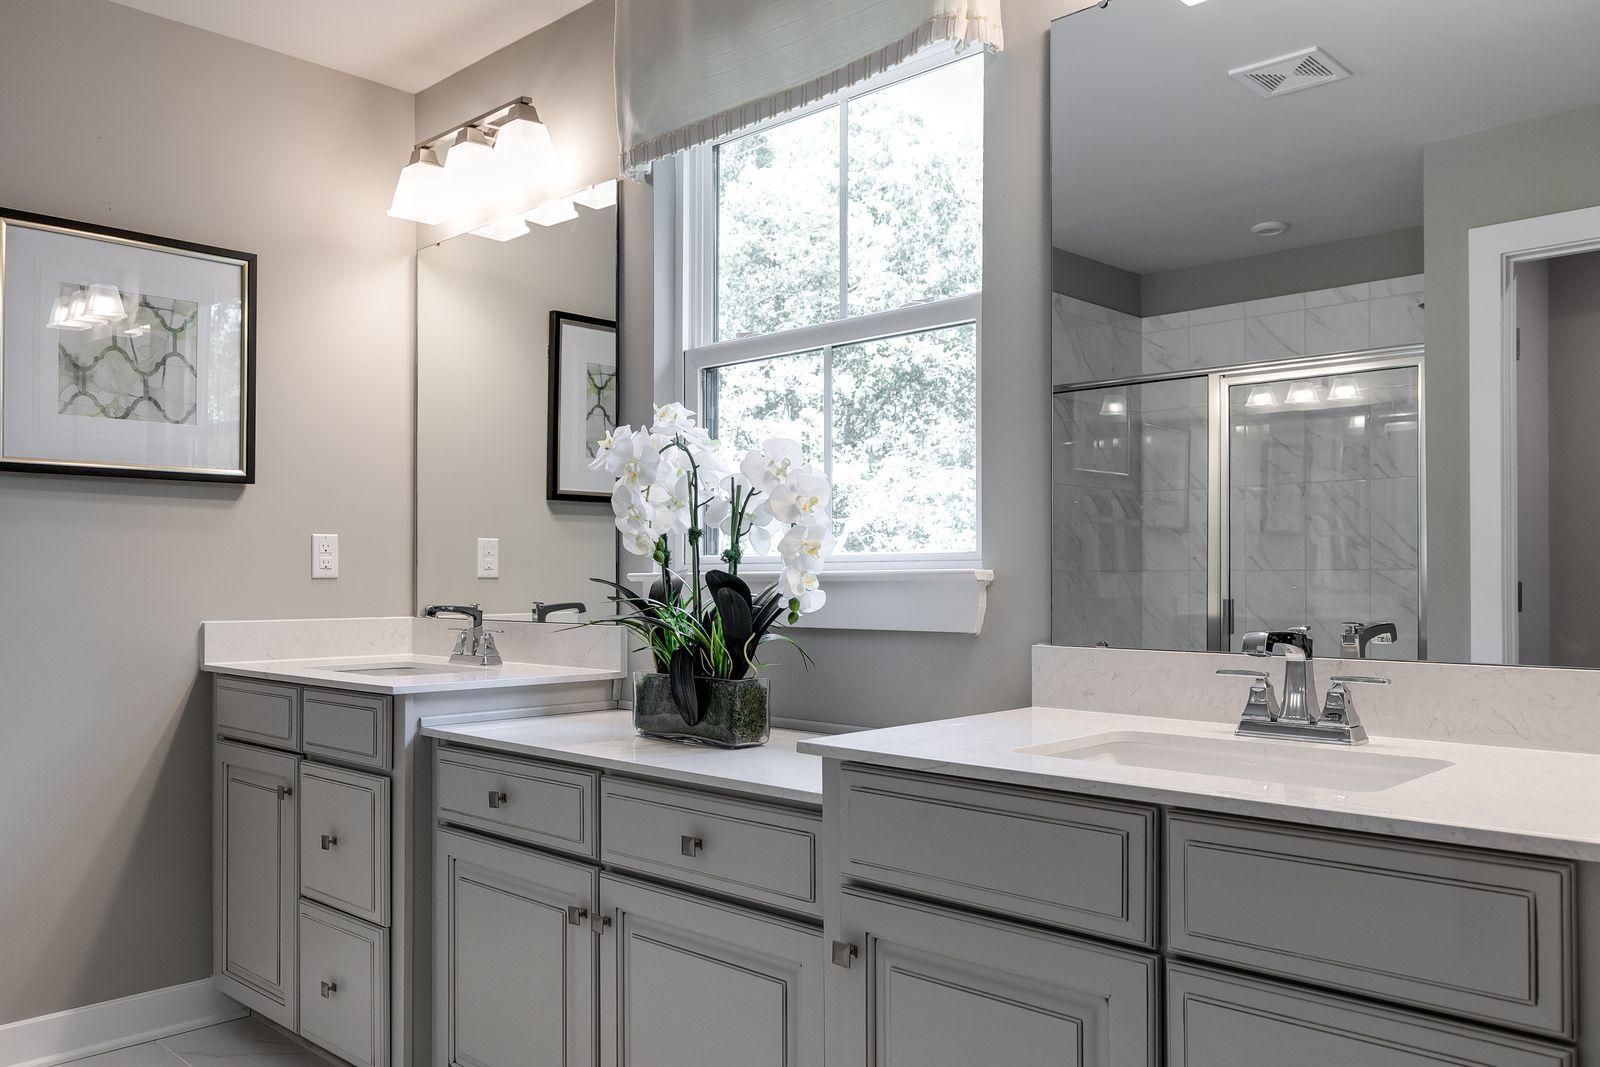 Bathroom featured in the Seneca at Hartland By Ryan Homes in Washington, VA